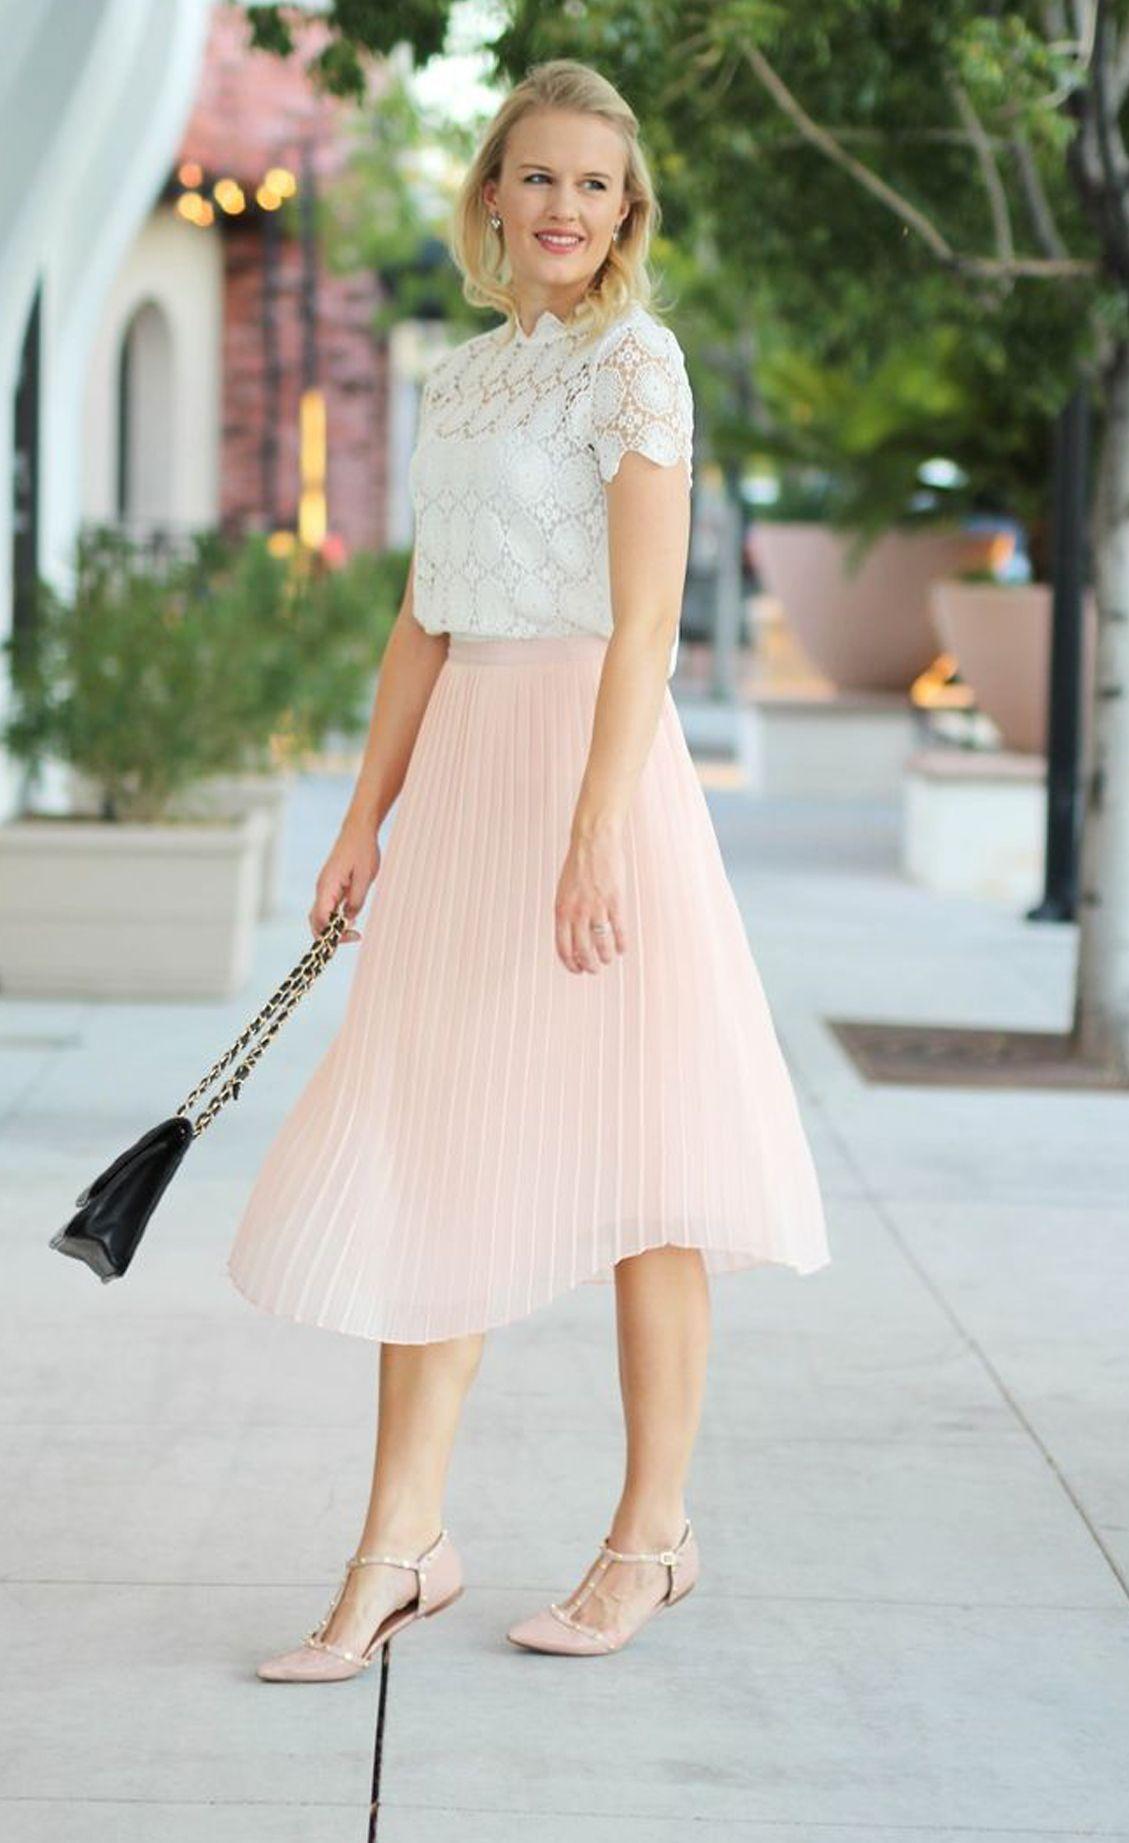 6d0790b2b0 blush pleated midi skirt, chic spring essentials every girl needs ...